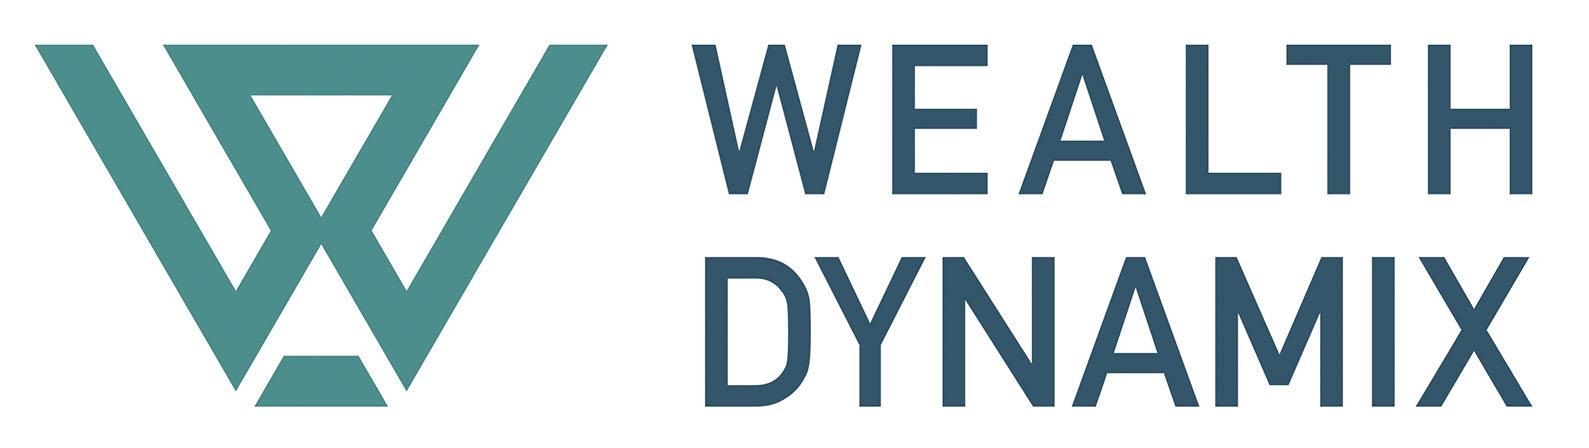 Wealth Dynamix logo NEW 2019